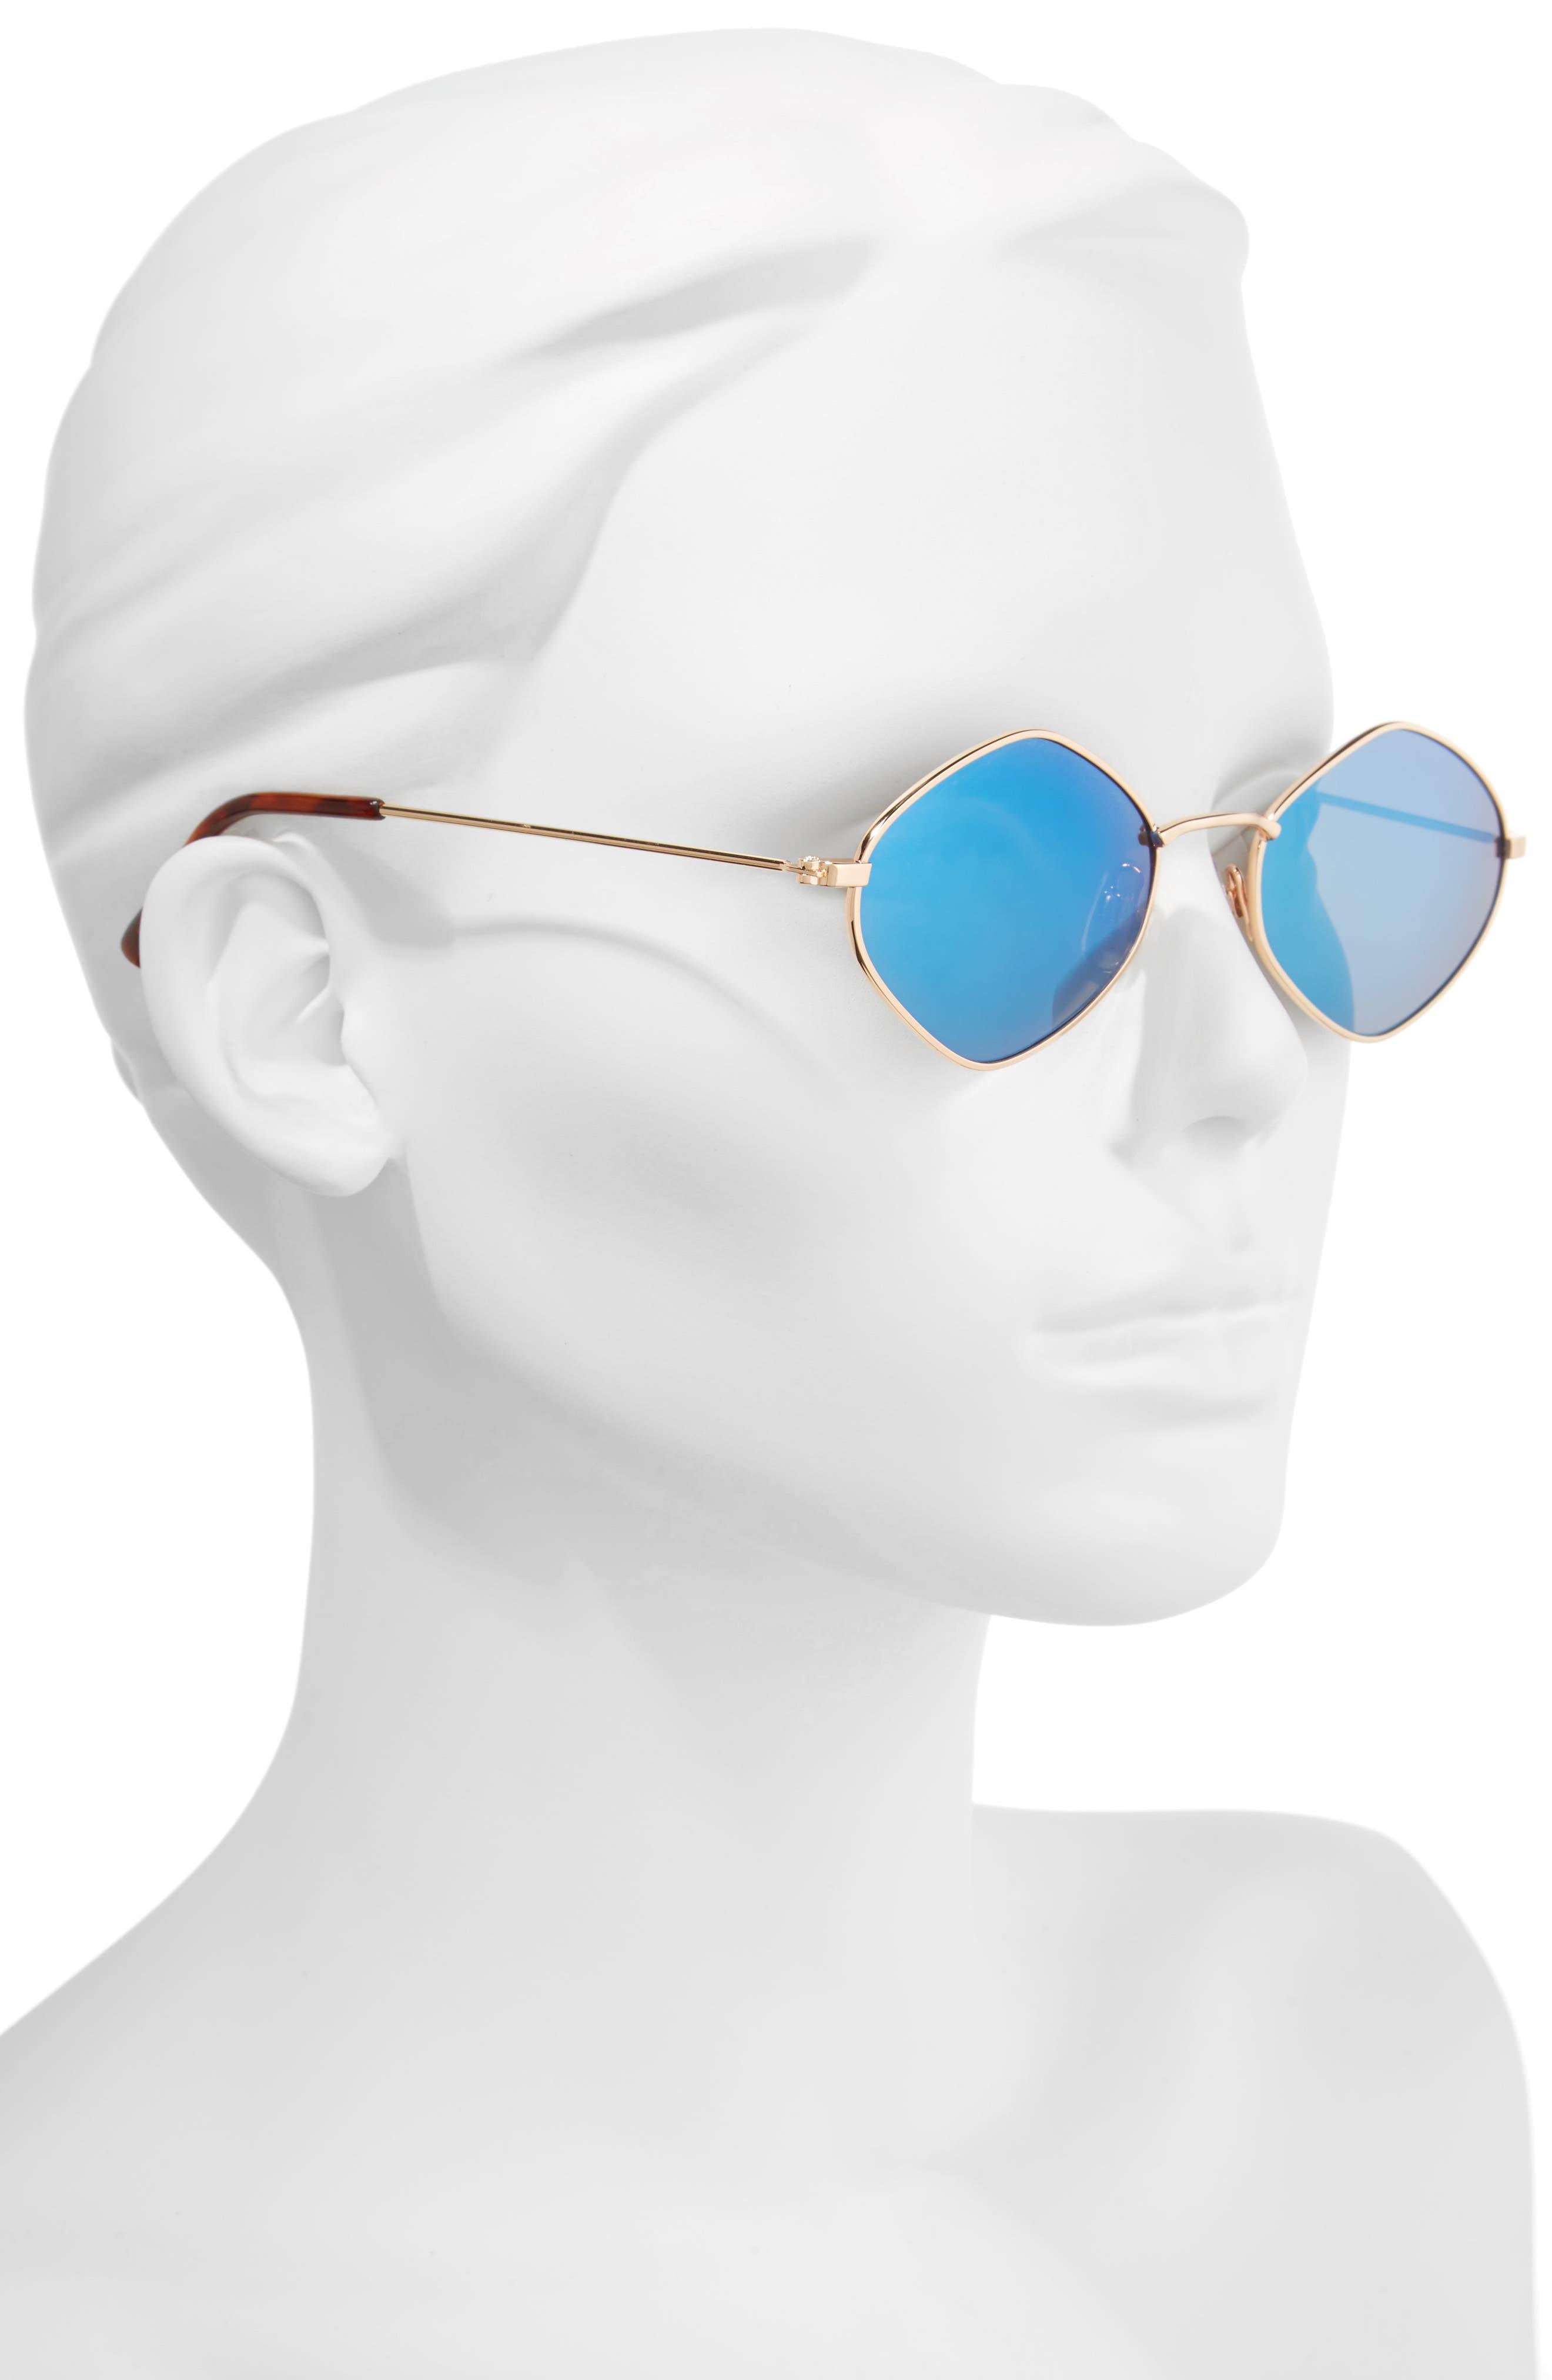 57mm Geo Sunglasses,                             Alternate thumbnail 2, color,                             Gold/ Blue